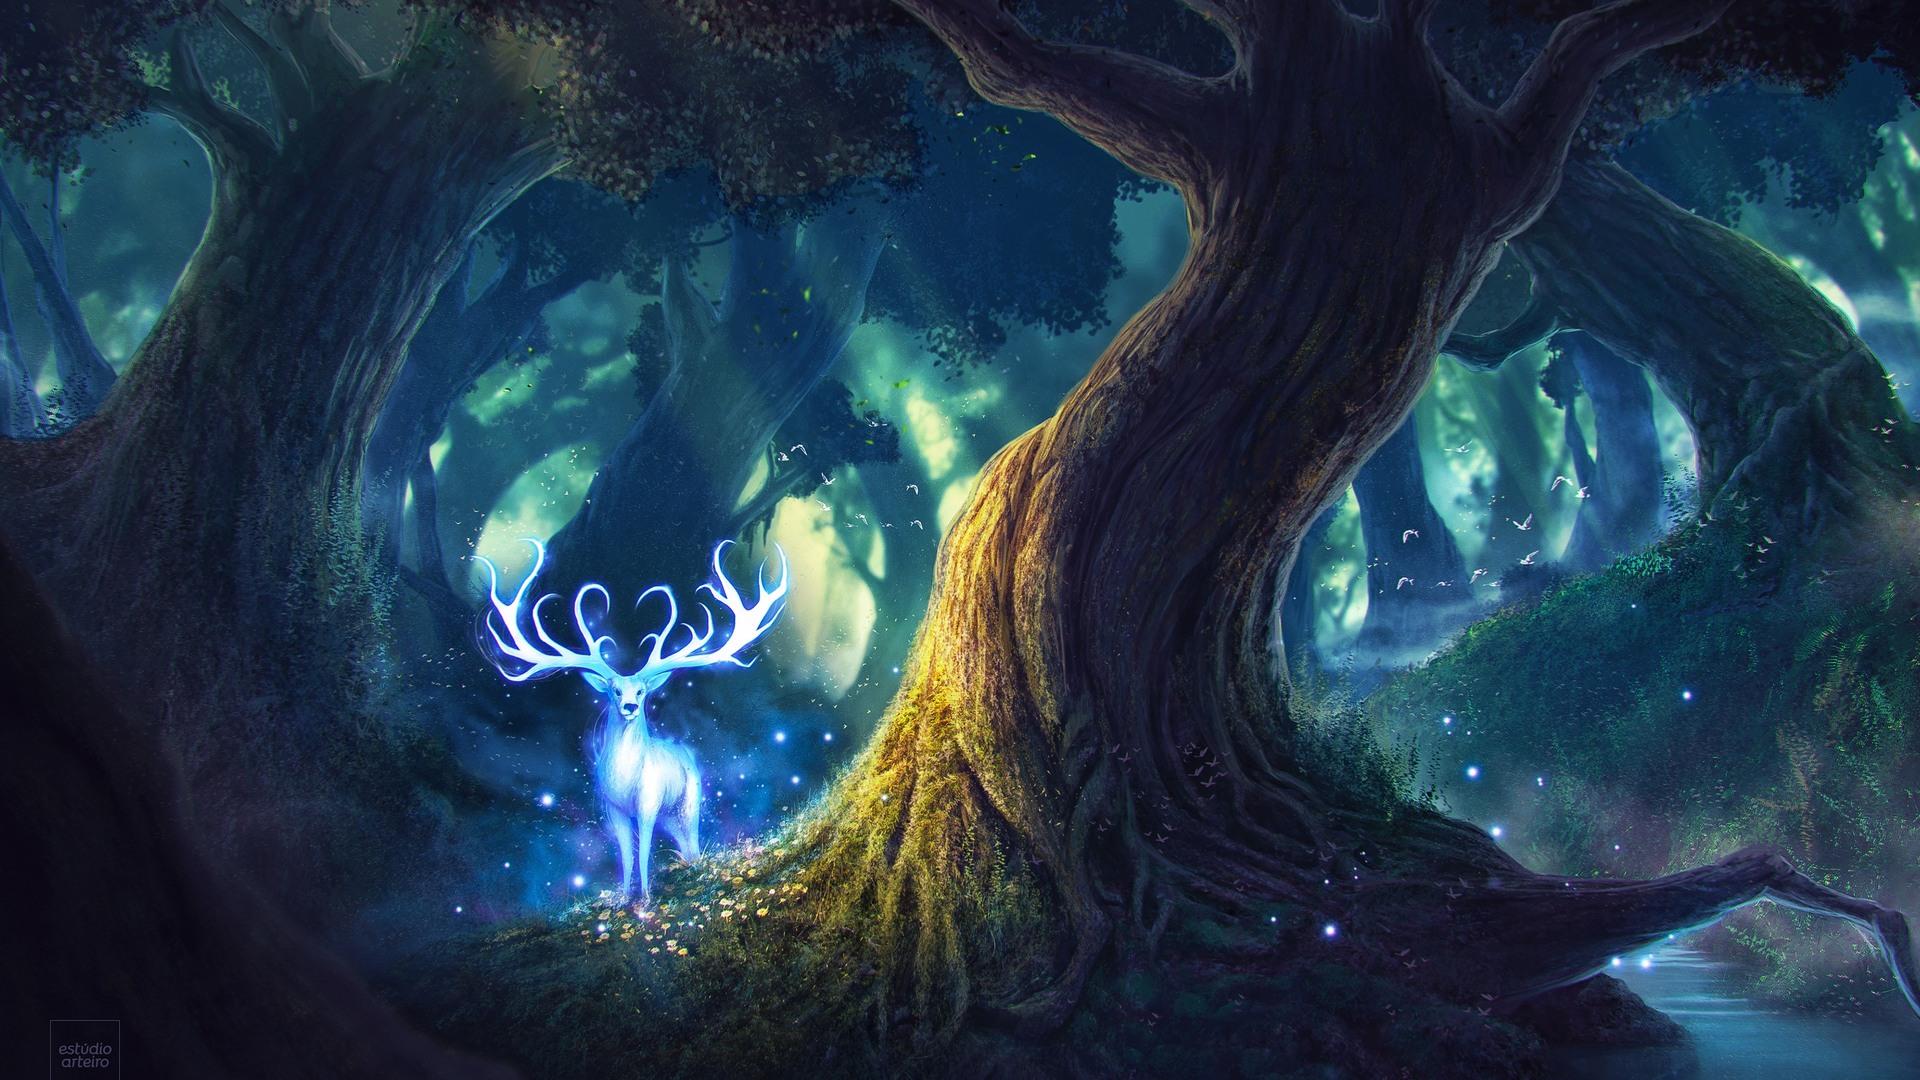 magic-forest-fantasy-deer-db.jpg